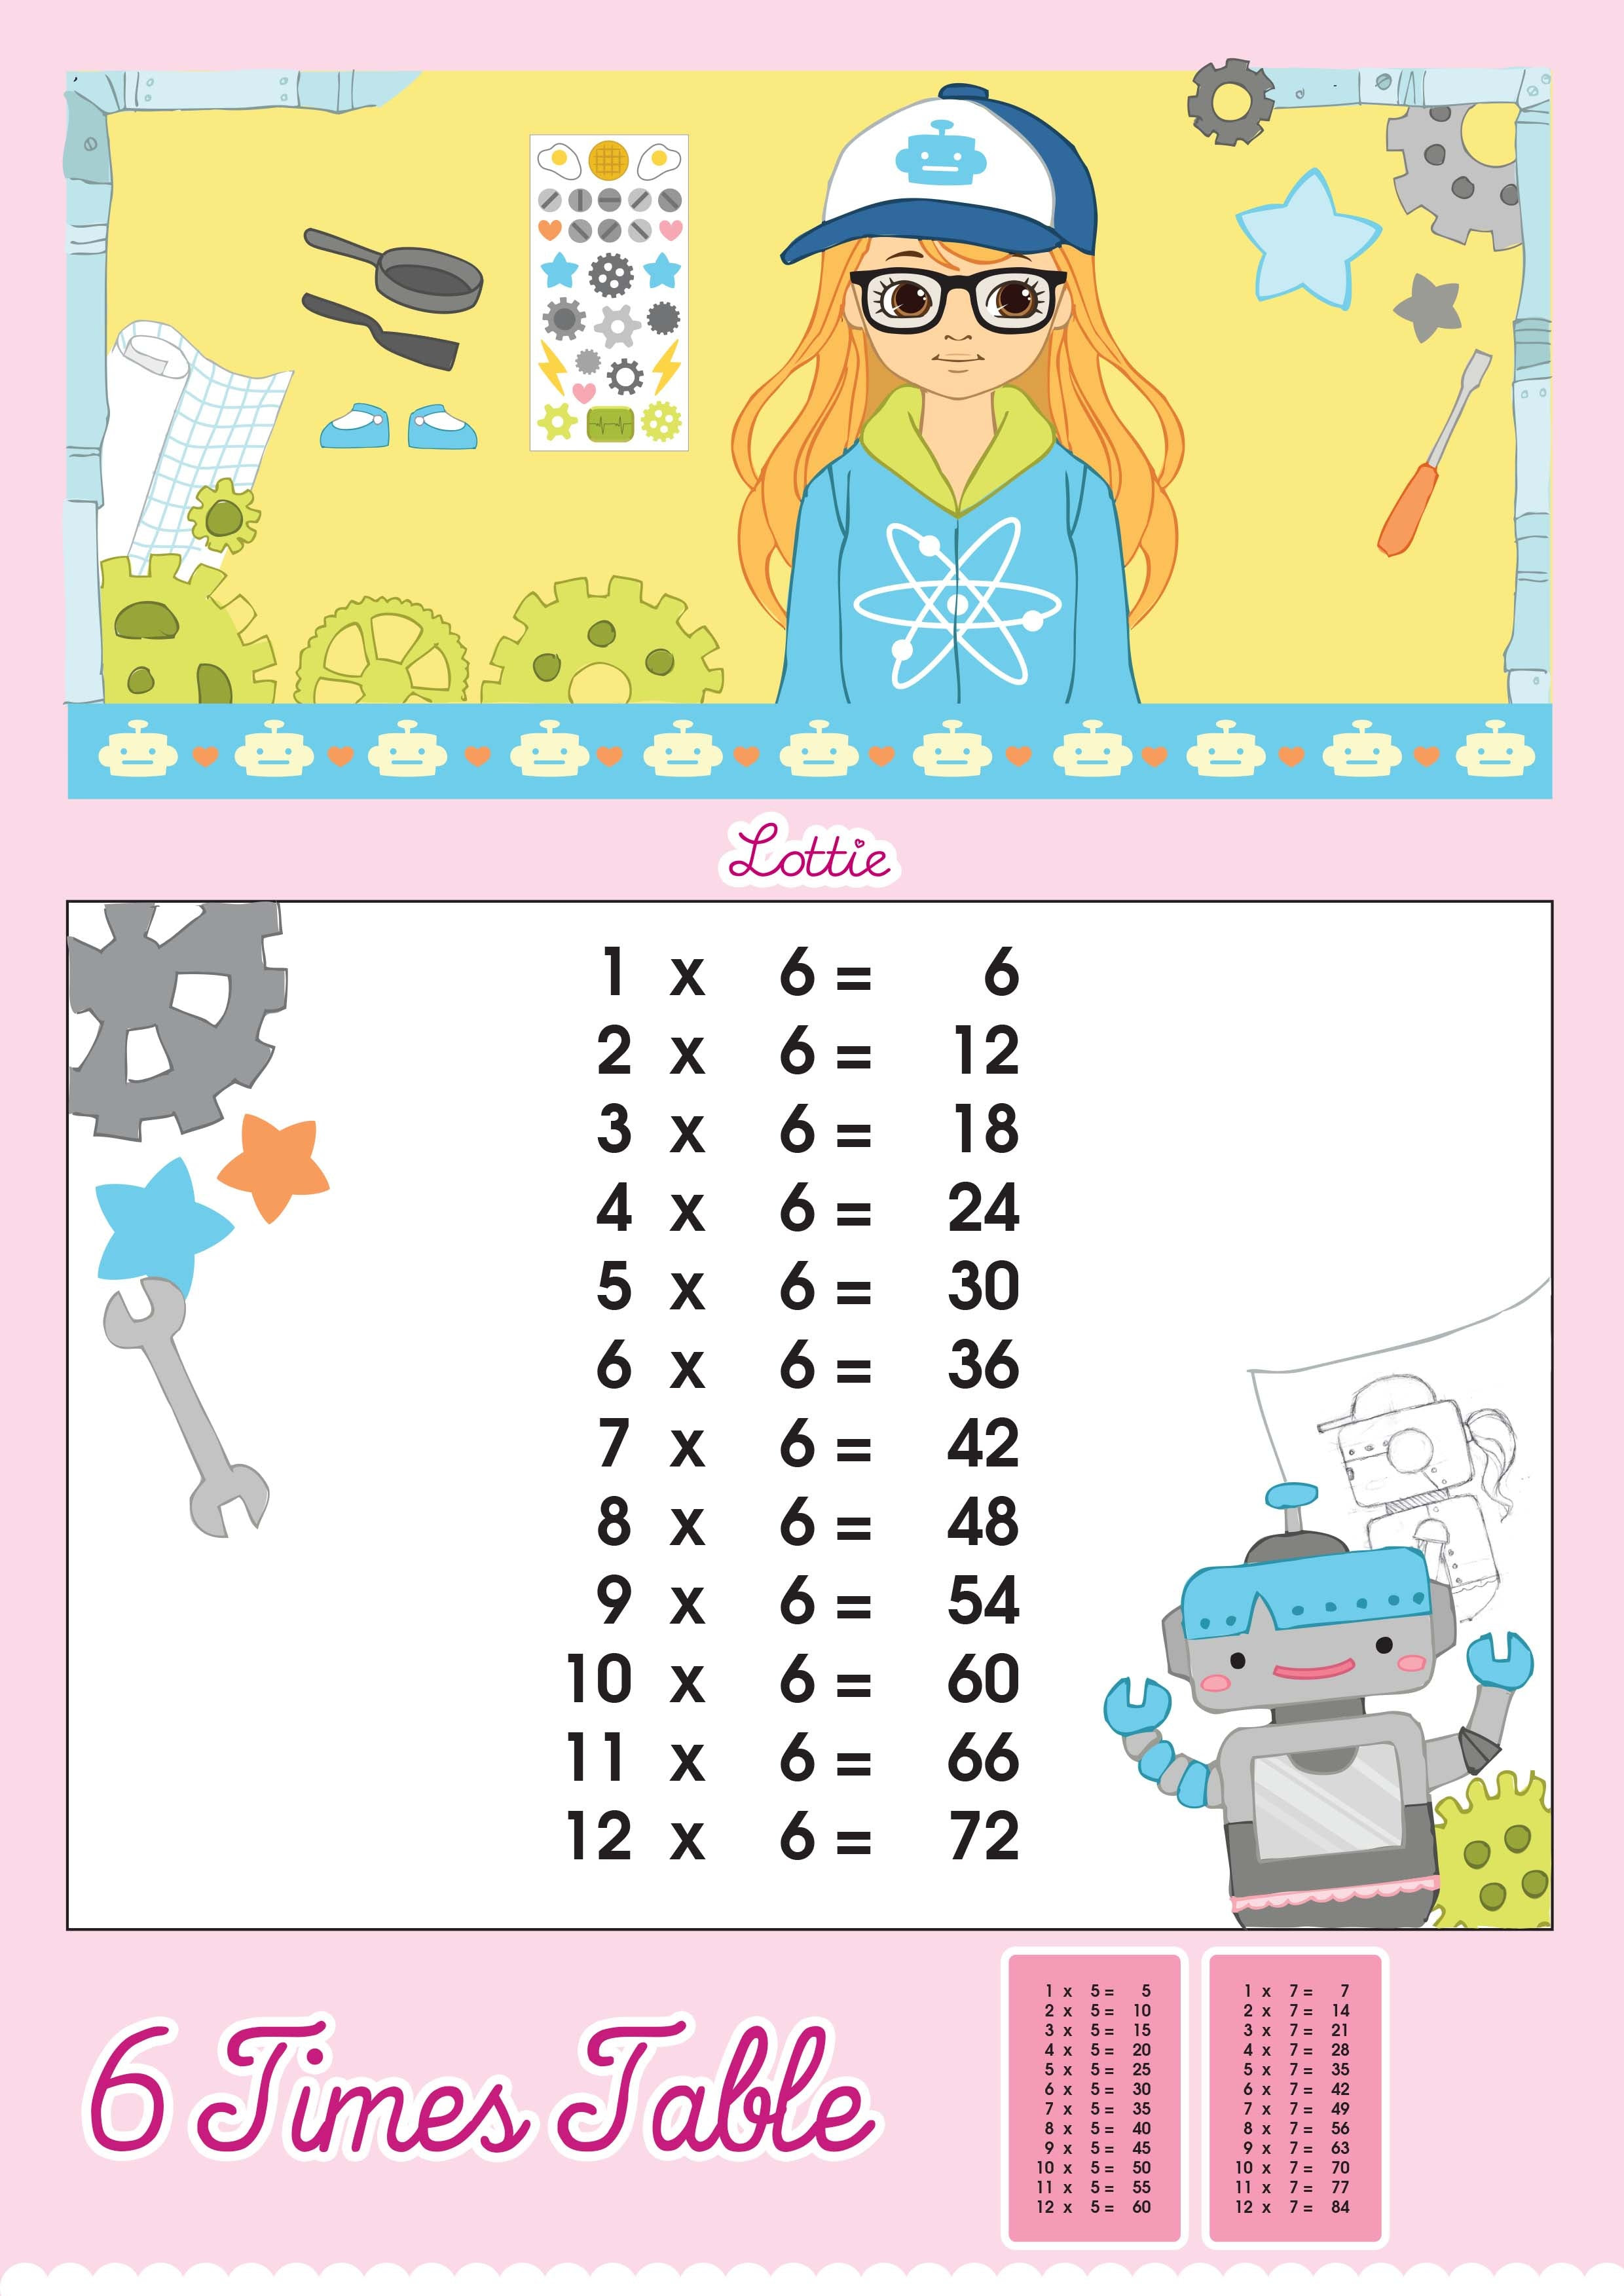 6 Times Table Printable Chart – Lottie Dolls